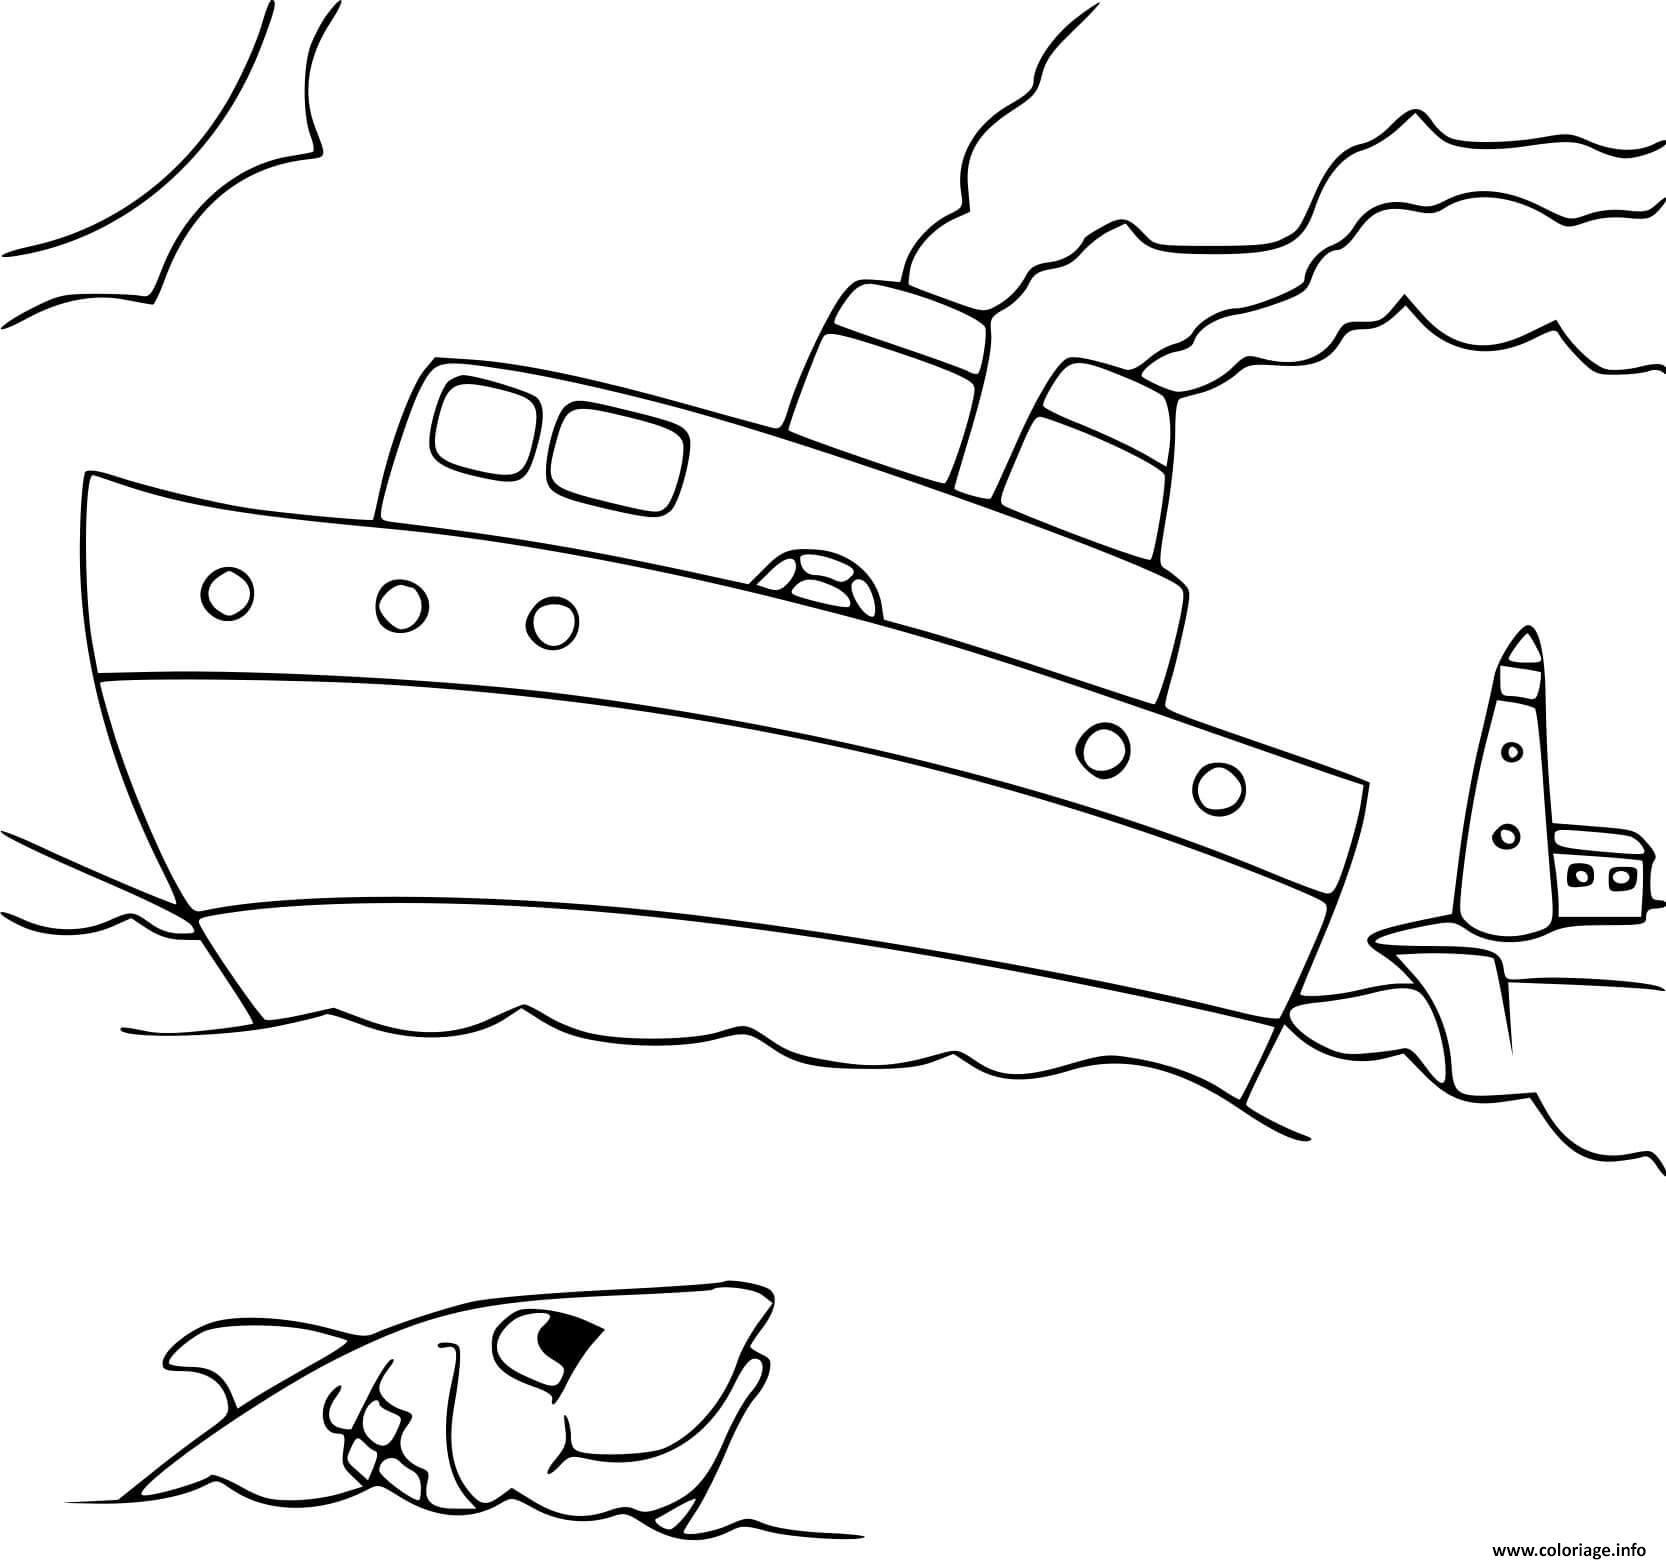 Dessin monde de la mer bateau marin Coloriage Gratuit à Imprimer